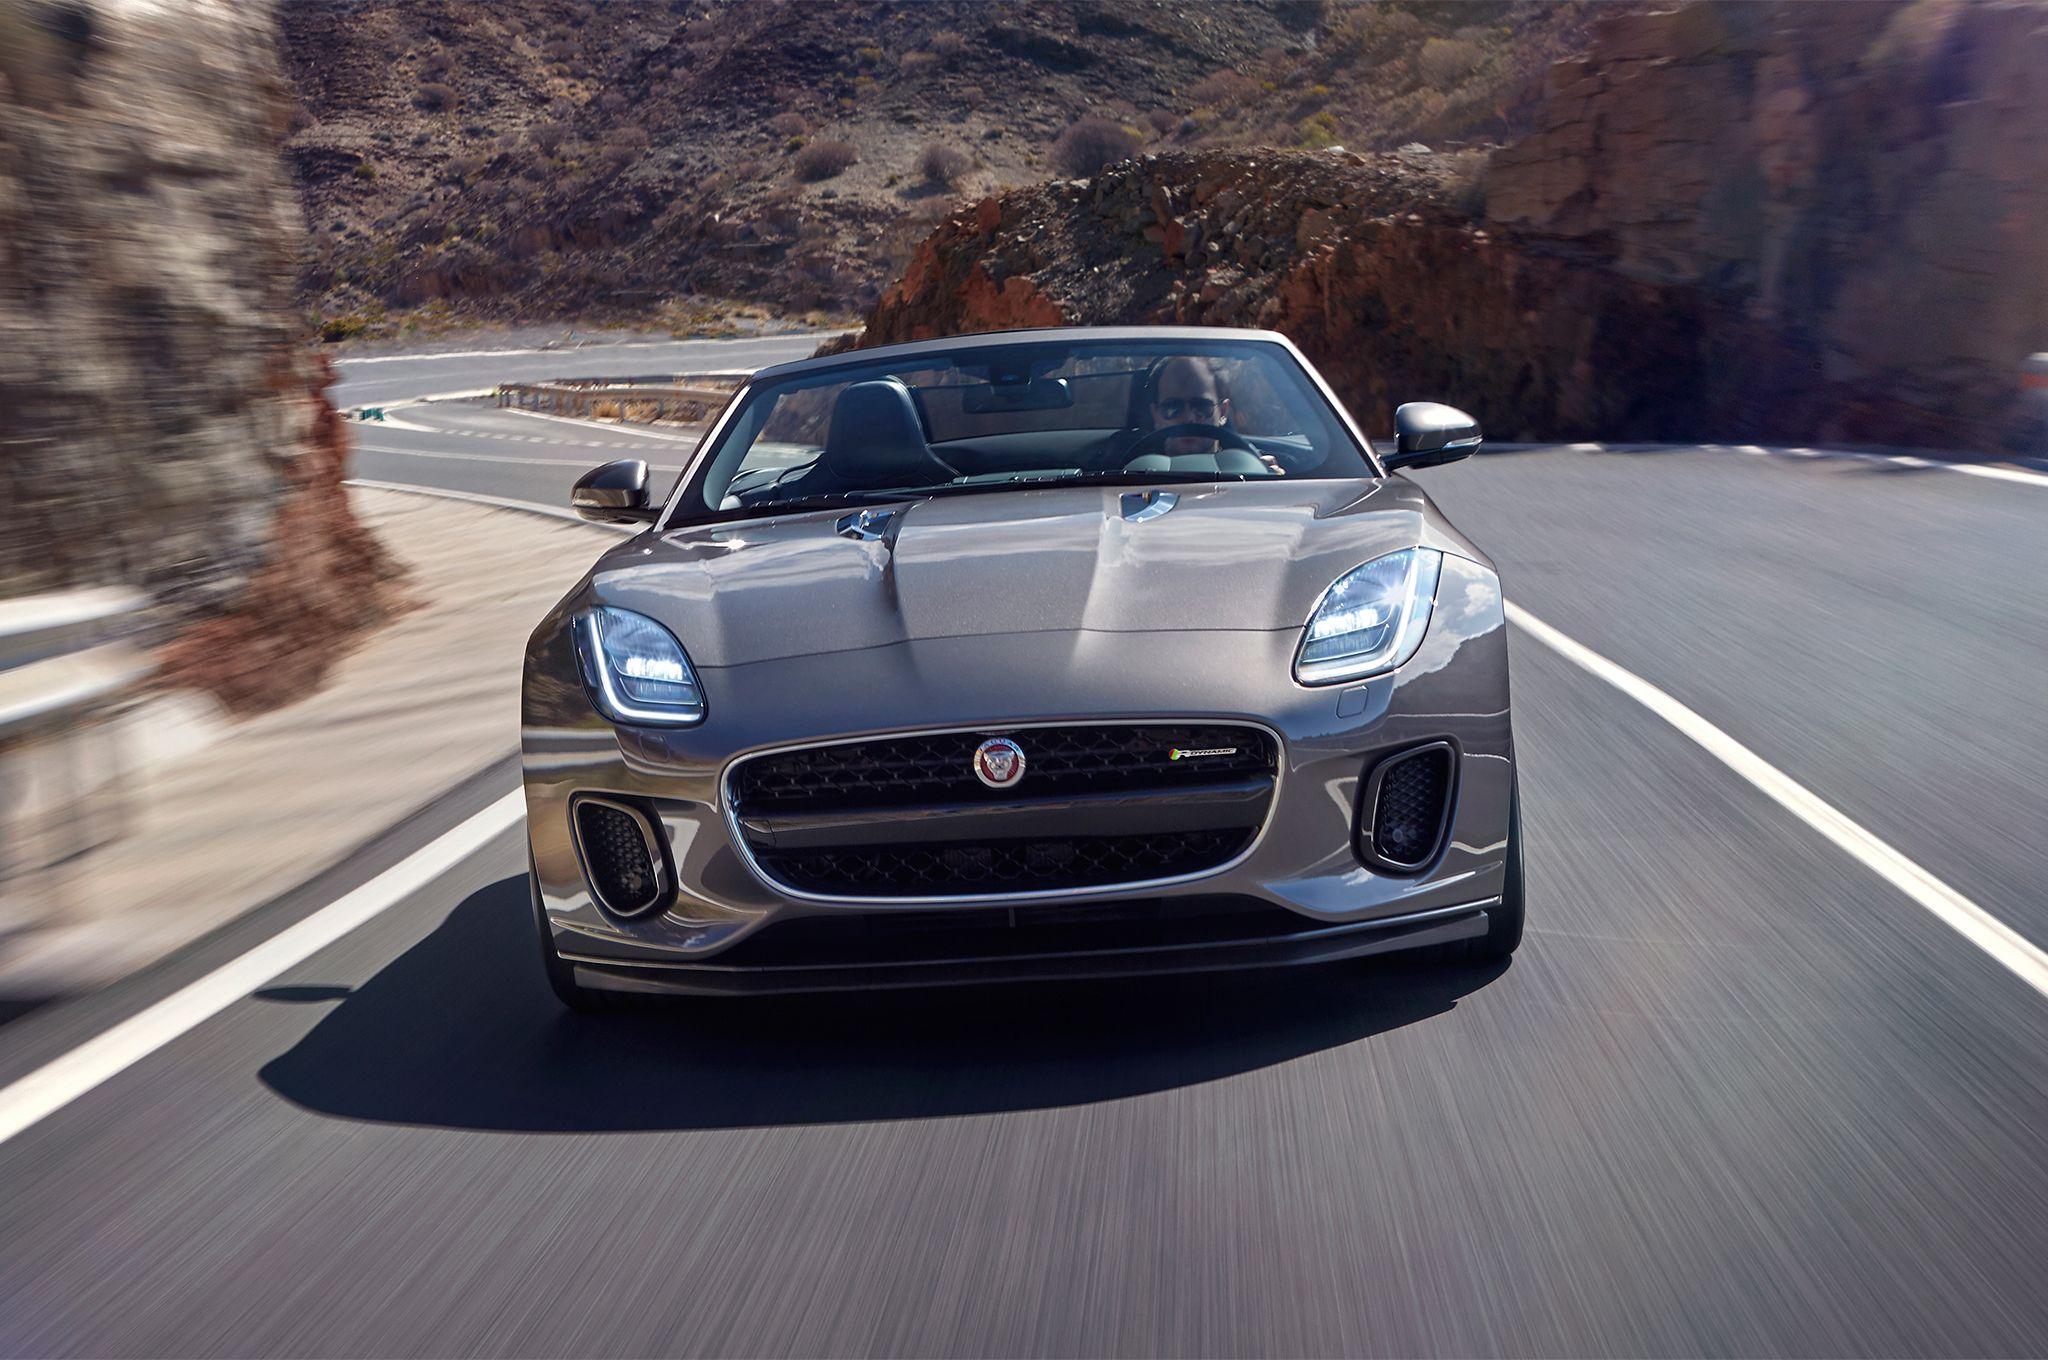 luxury jaguar vehicles condition price perfect carsedan qatar kopie living good of